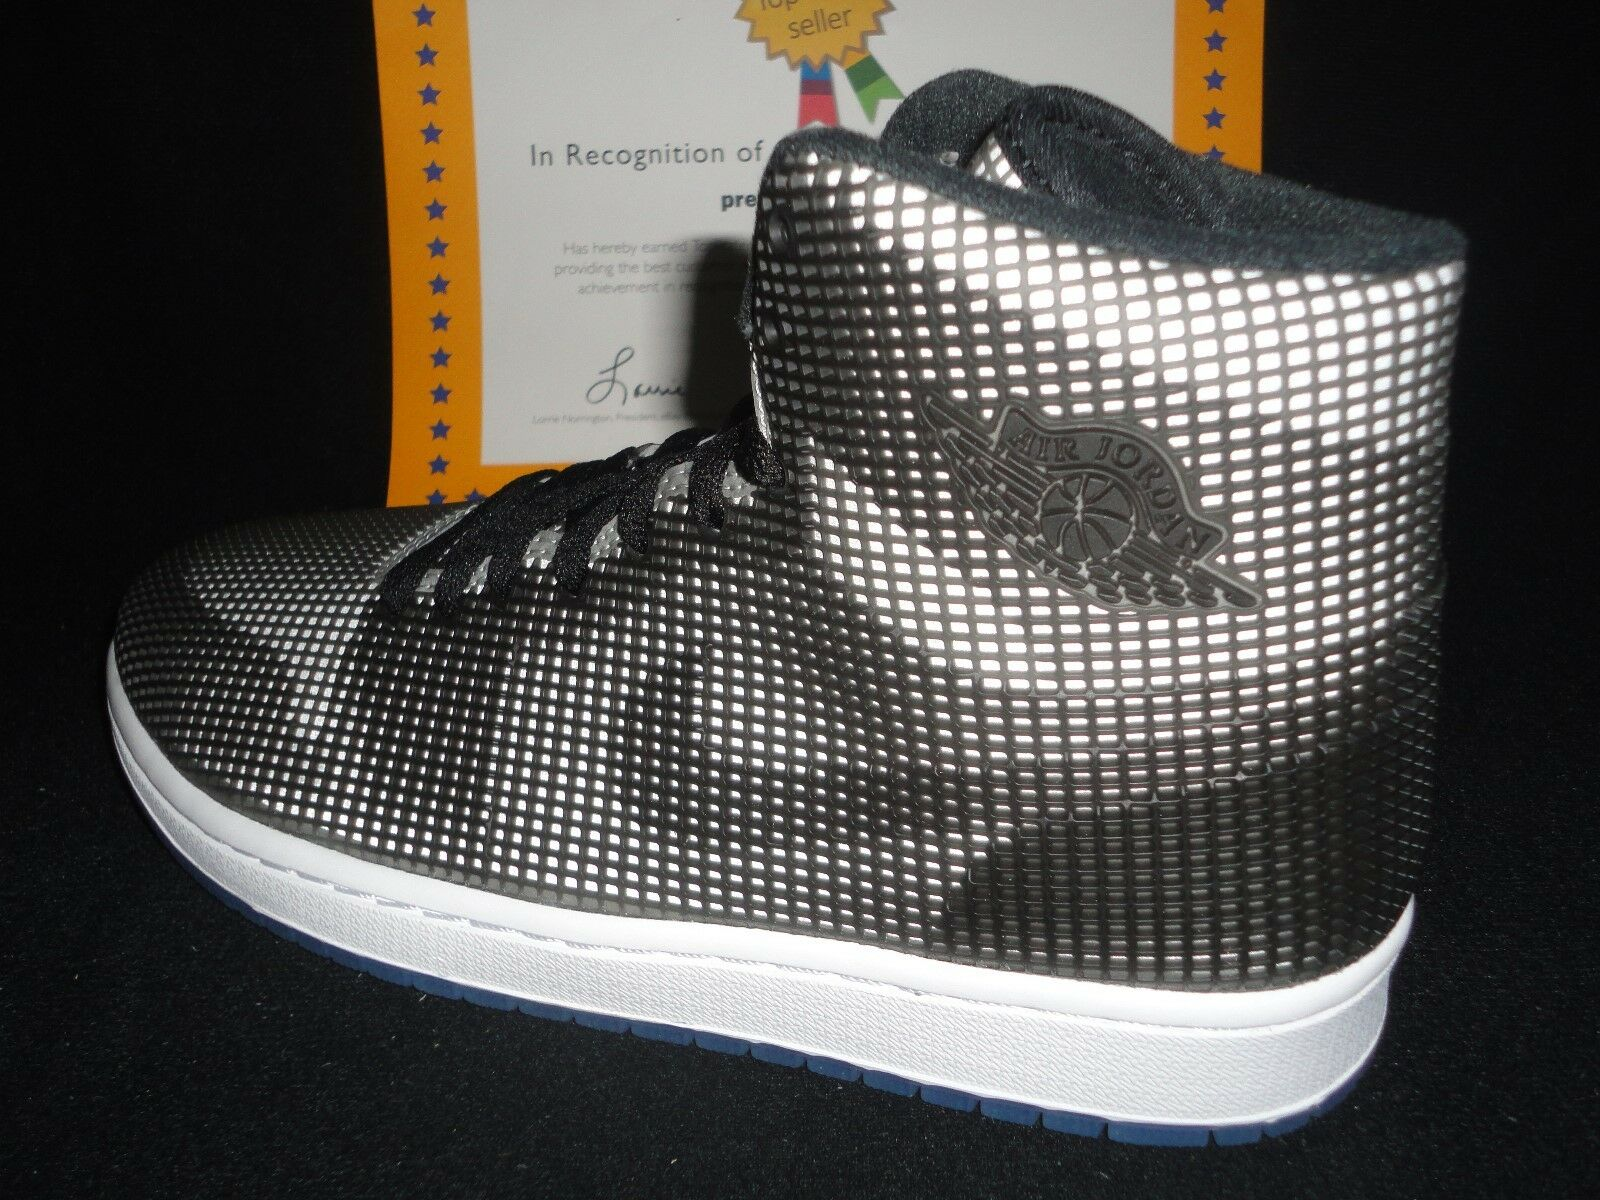 Nike Air Jordan 4LAB1, Black / Reflective Siver, Size 10.5